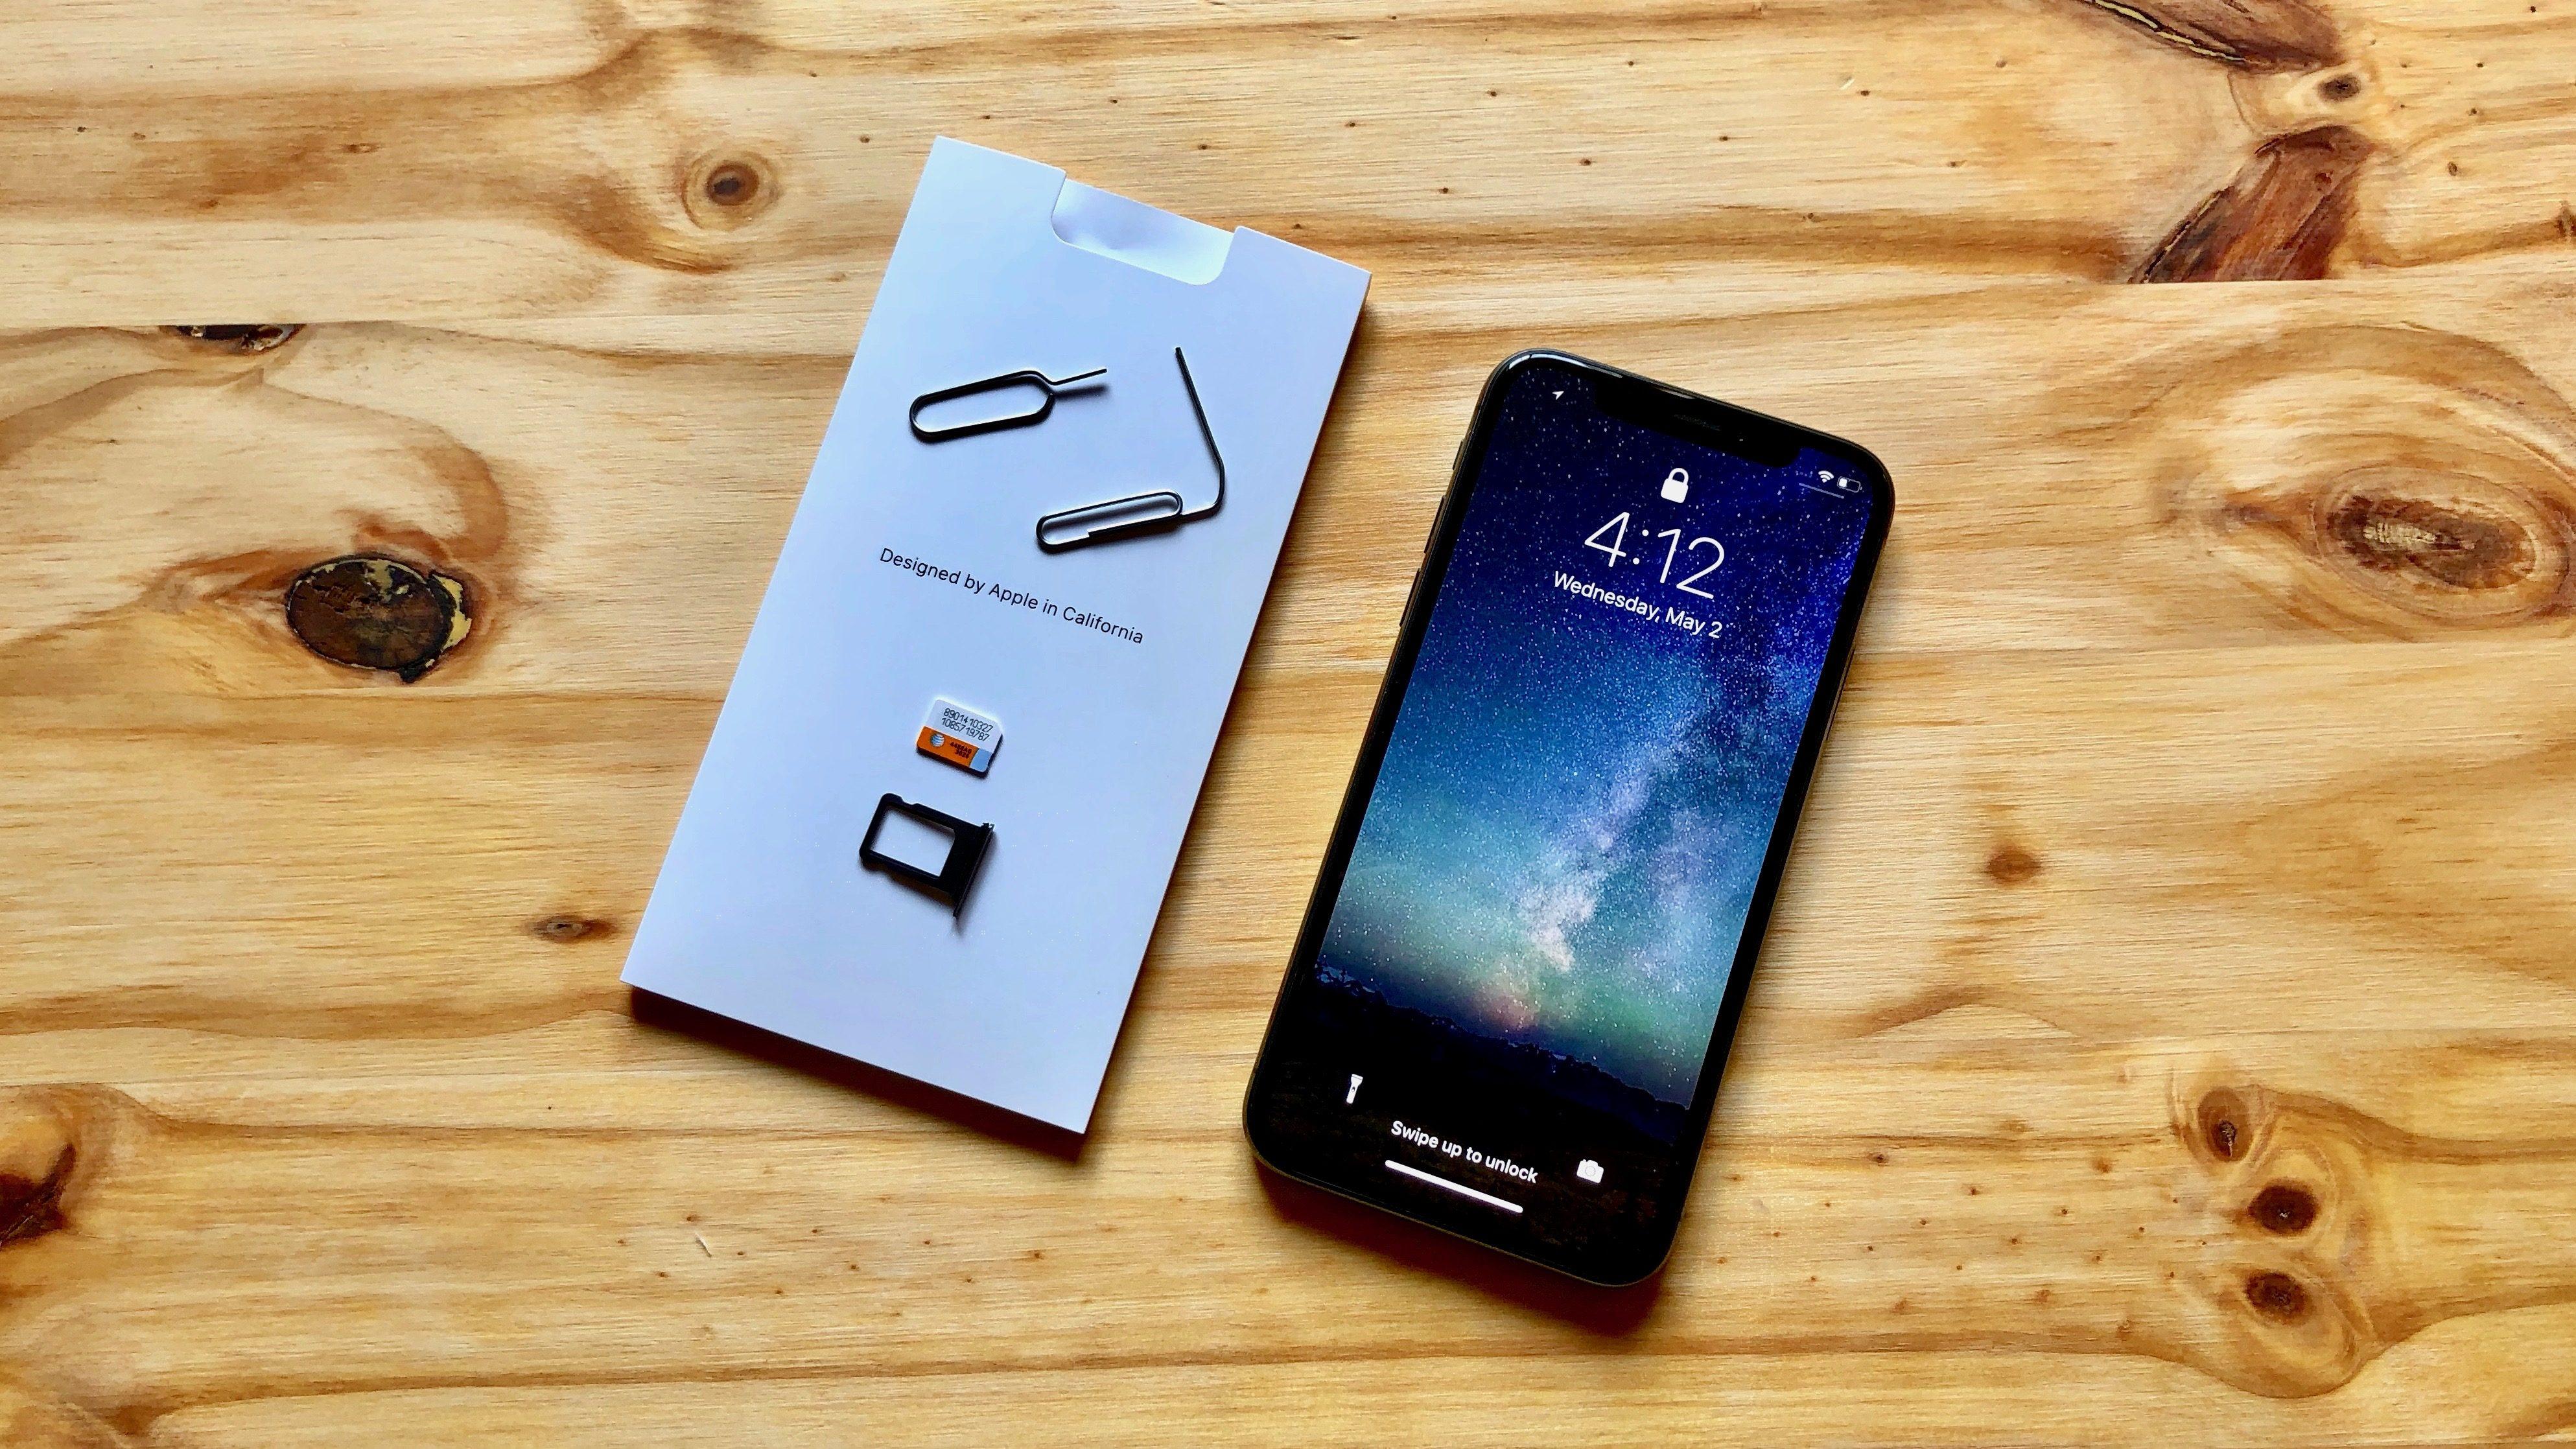 "<span href=""https://9to5mac.com/2018/05/02/how-to-remove-switch-iphone-sim-card/"">Cómo quitar o cambiar su iPhone de la tarjeta SIM</a>"